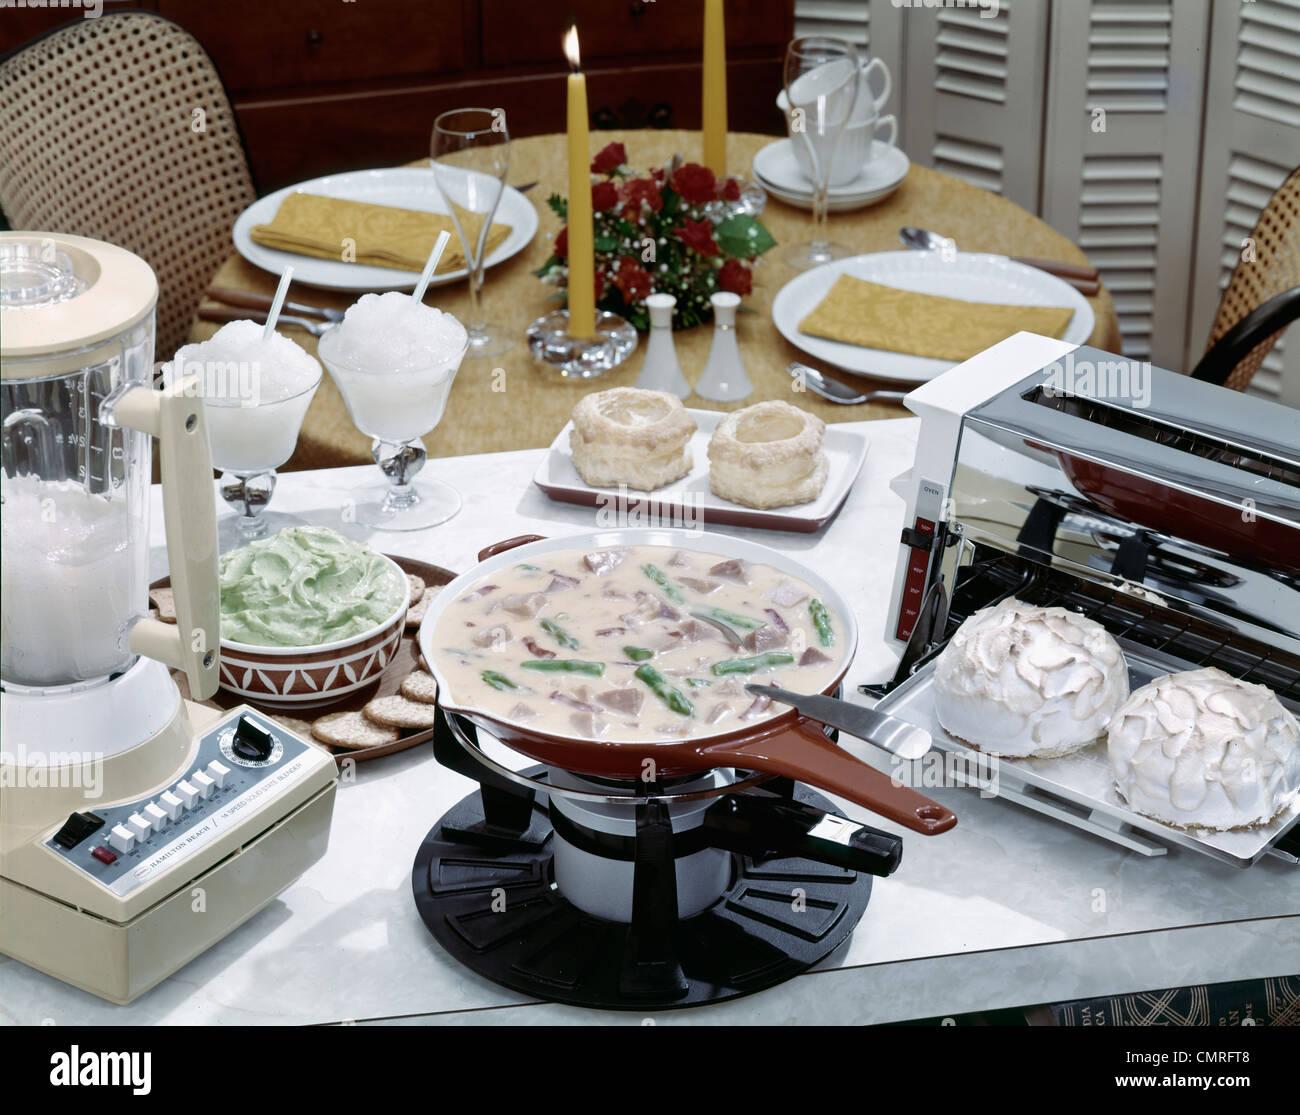 1970s STILL LIFE BLENDER FROZEN DAIQUIRI AVOCADO DIP HAM CASSEROLE MERINGUE TARTS TABLE SET FOR DINNER FOR TWO - Stock Image